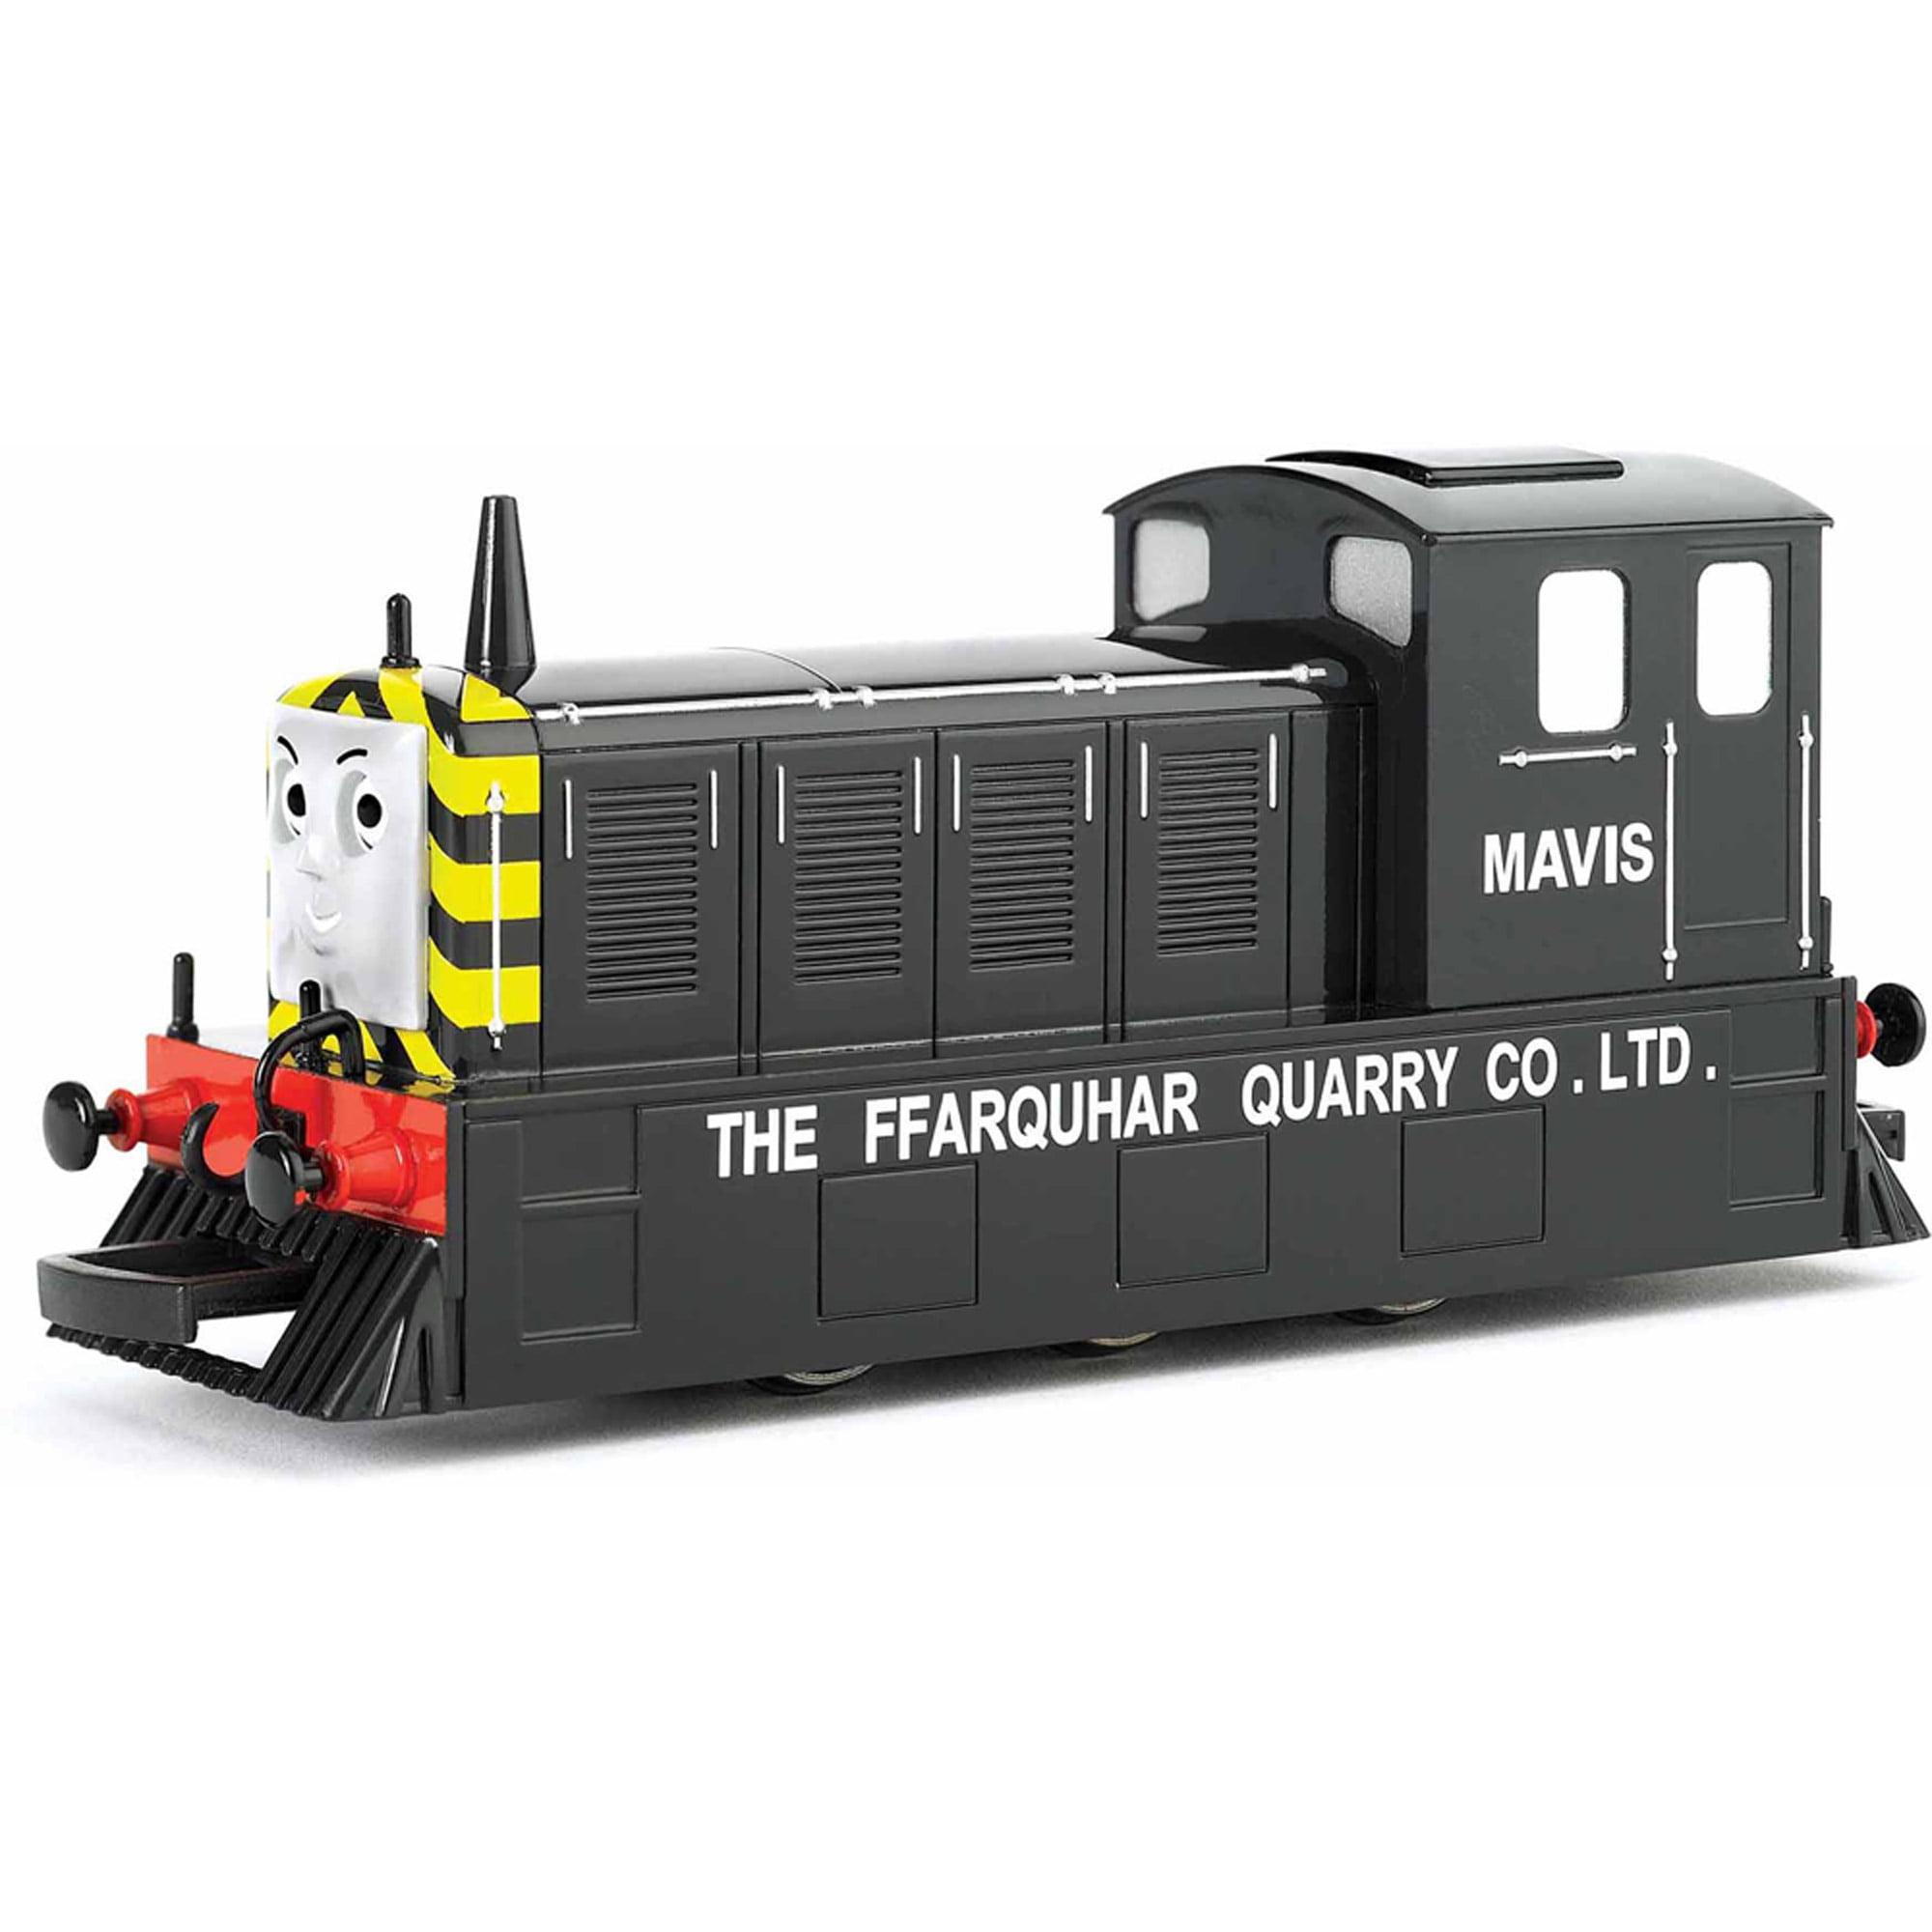 4fda2cd4250 Bachmann Trains Thomas and Friends Mavis Locomotive with Moving Eyes ...